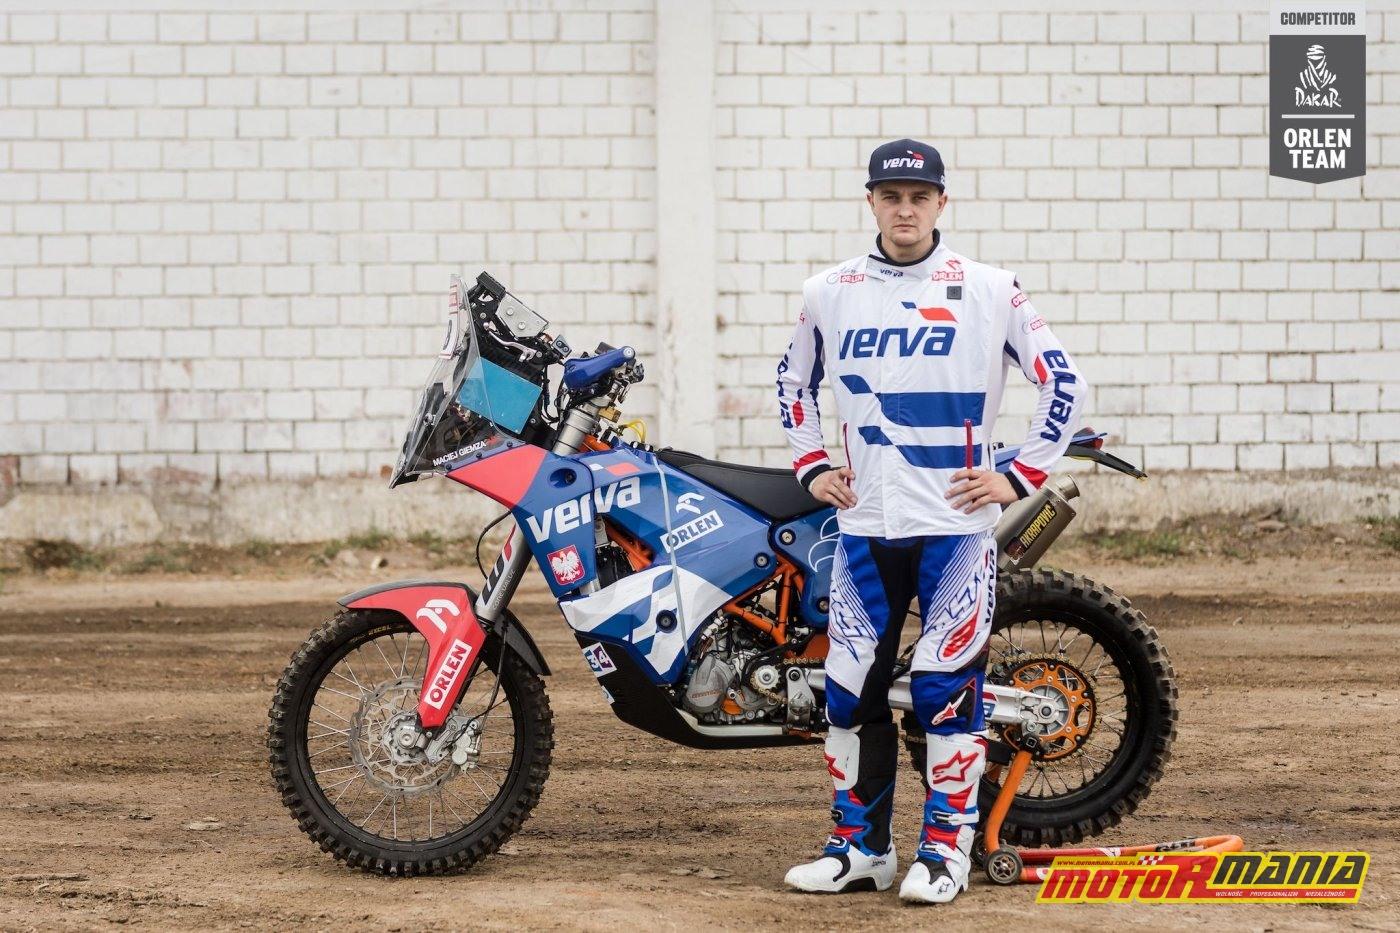 Dakar2018 ORLEN_Team MaciekGiemza4